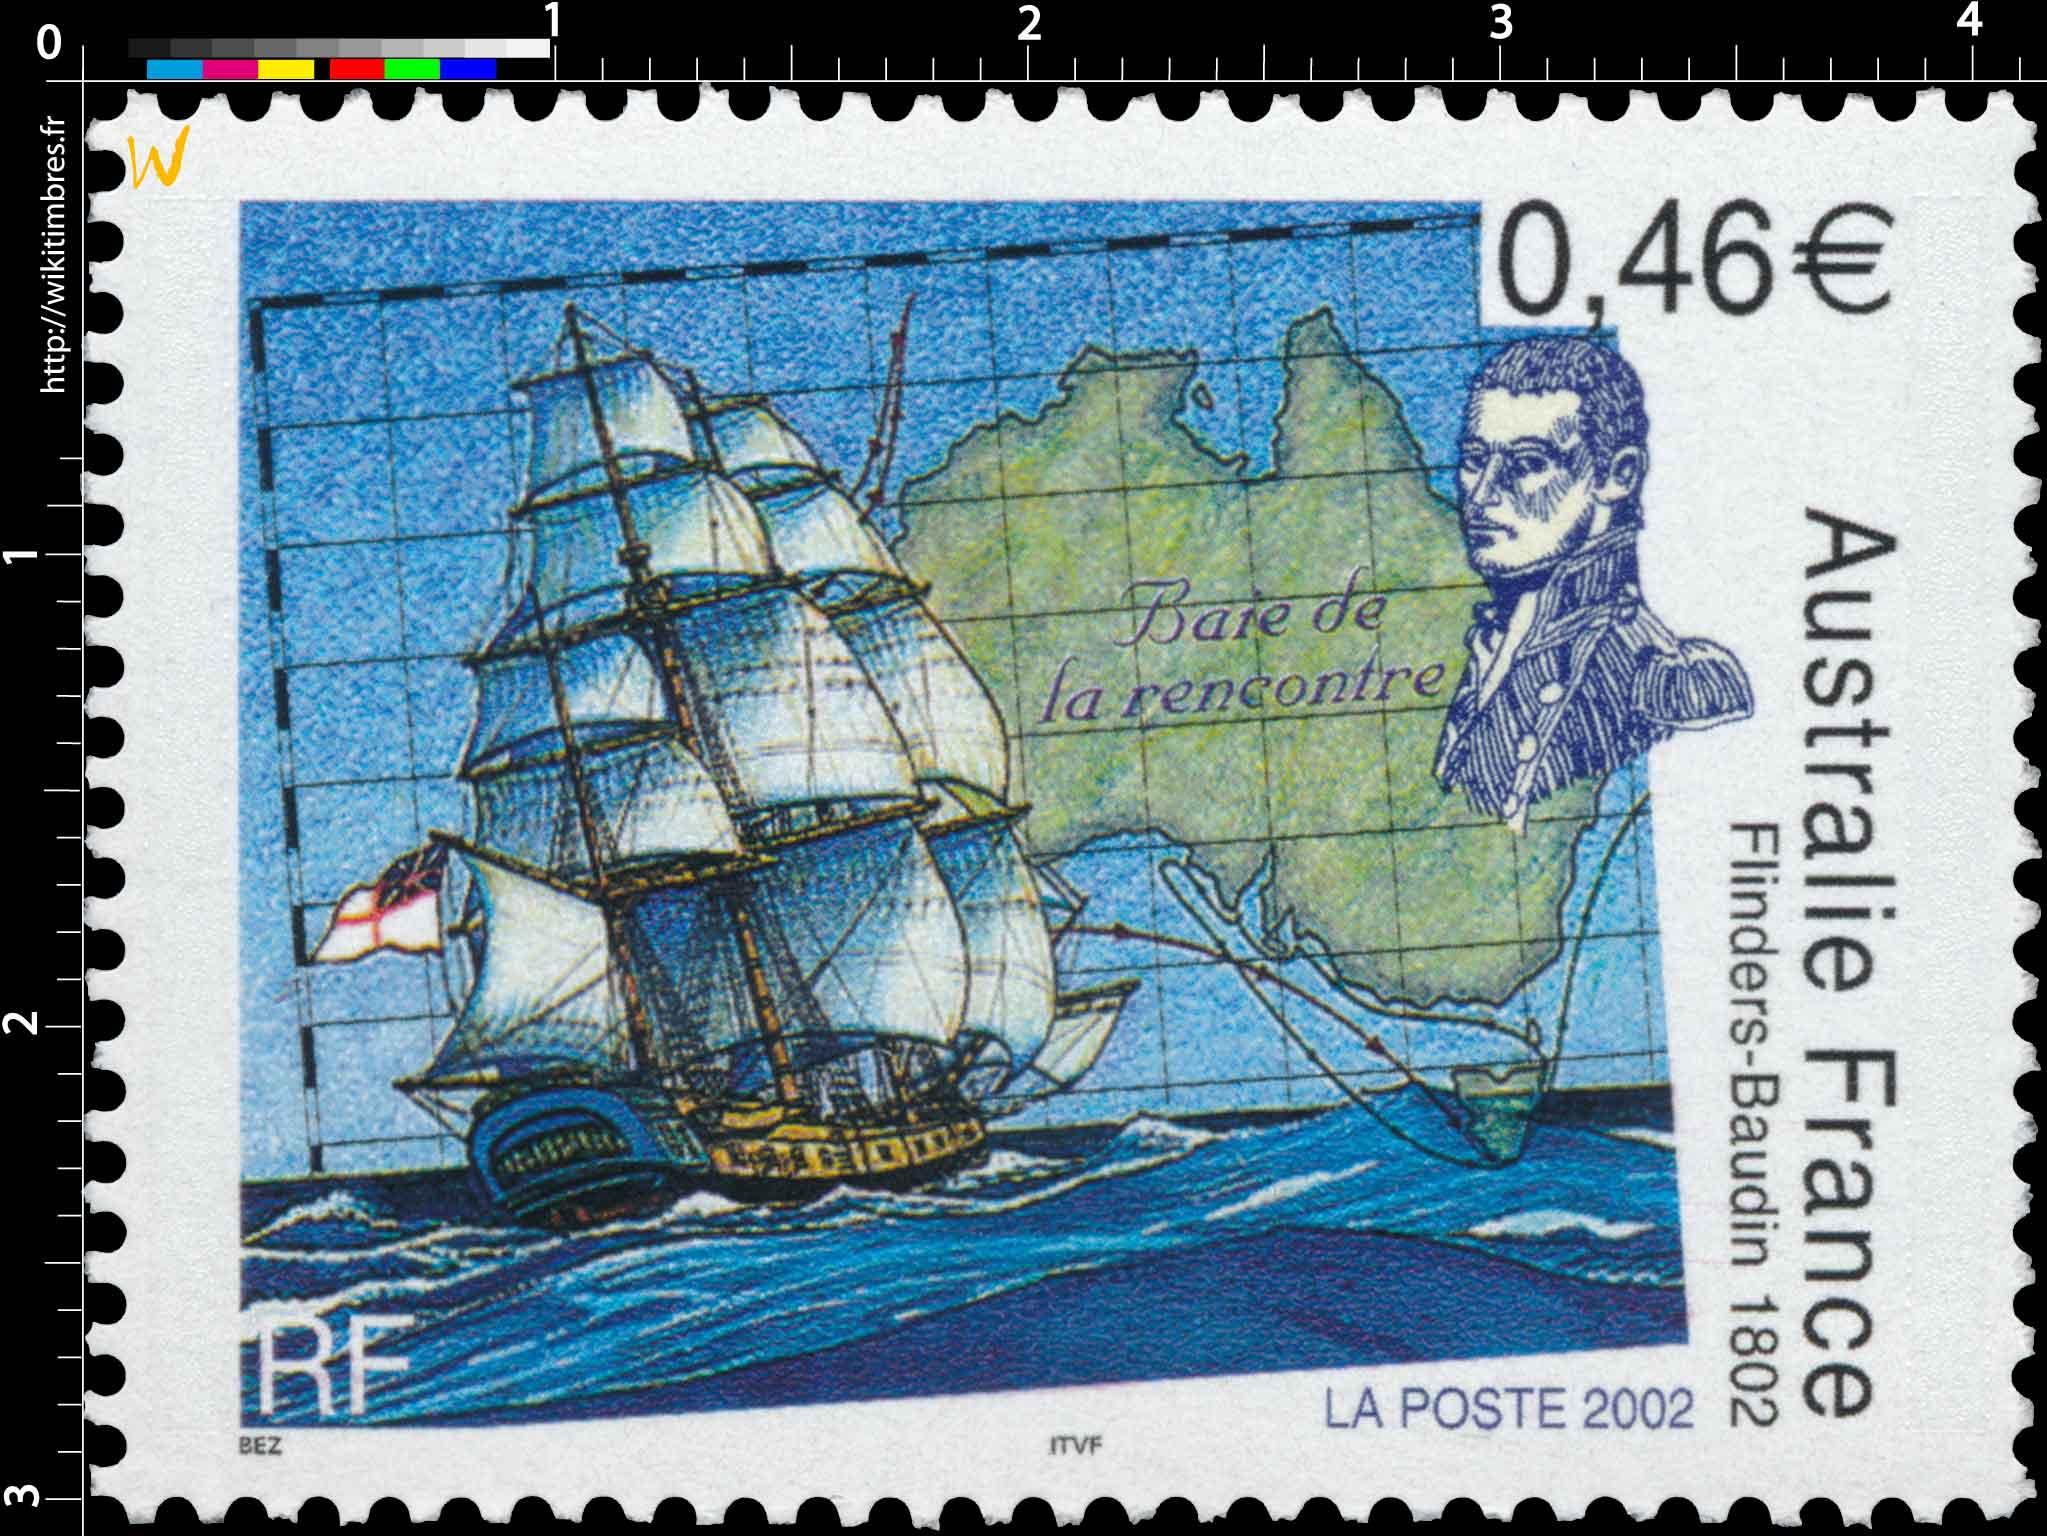 2002 Australie France Flinders-Baudin 1802 Baie de la rencontre